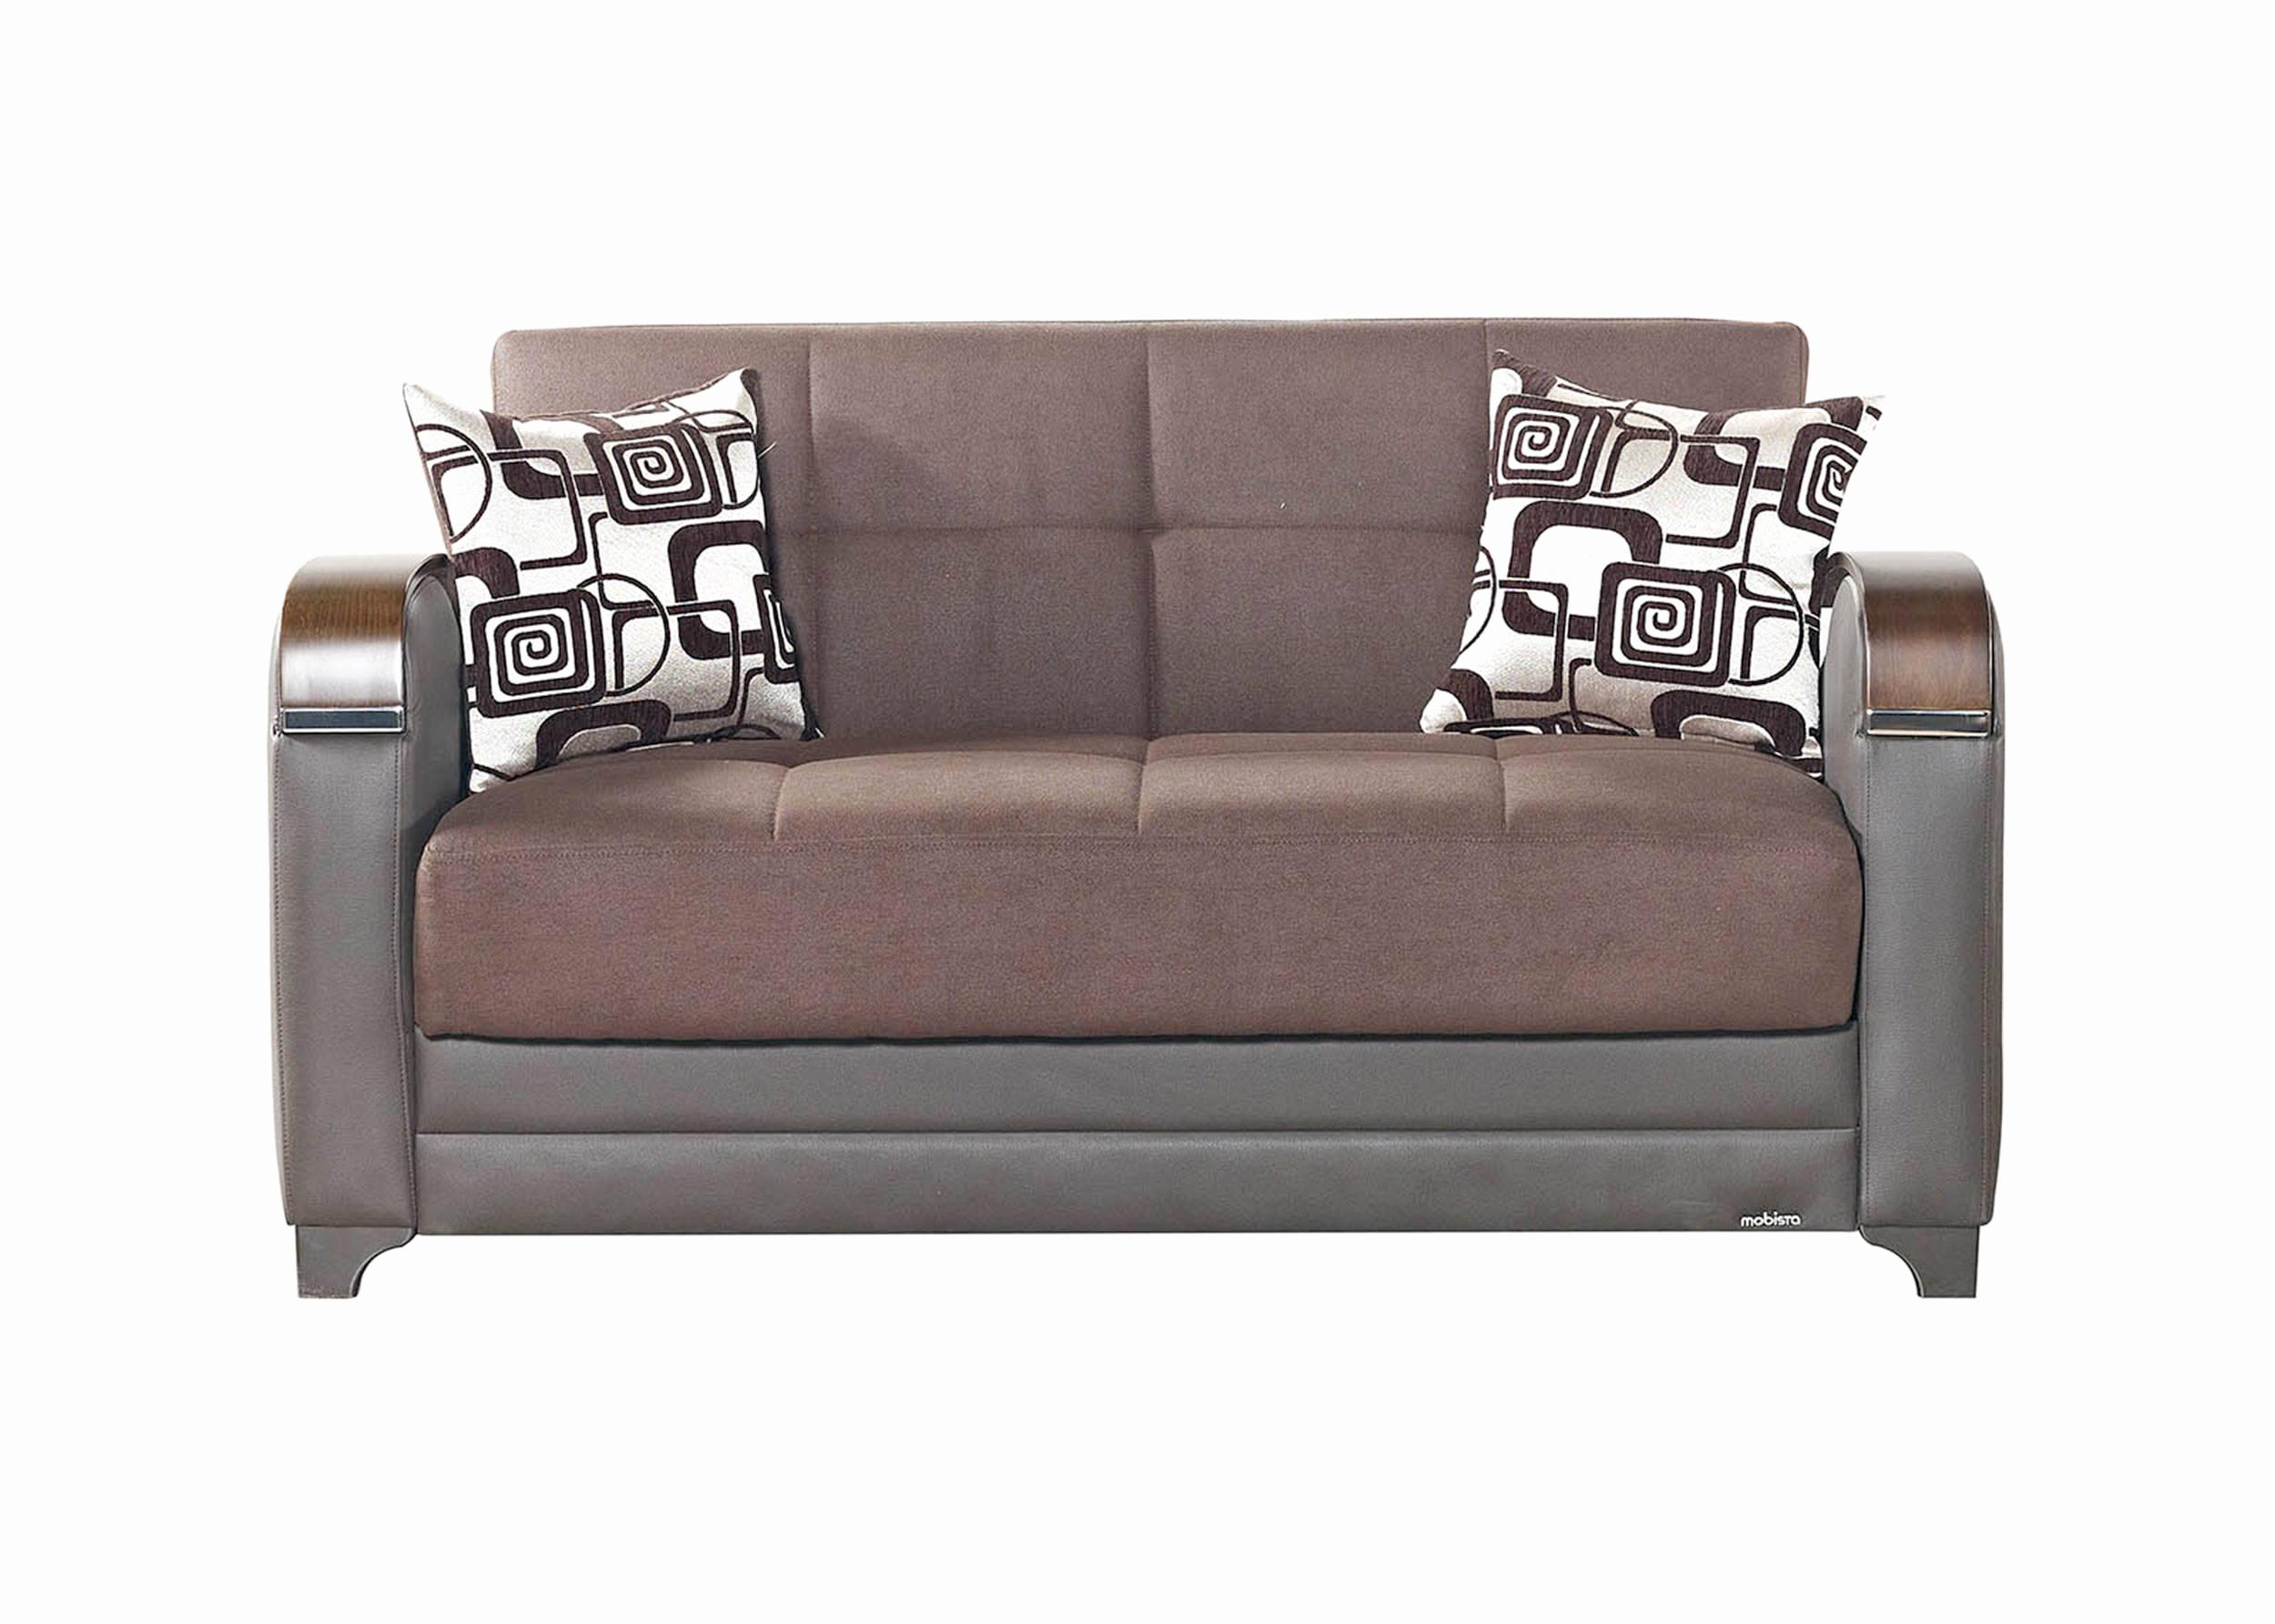 Vallentuna Ikea Avis Beau Photographie 50 Unique Friheten sofa Bed Ikea Reviews Pics 50 S